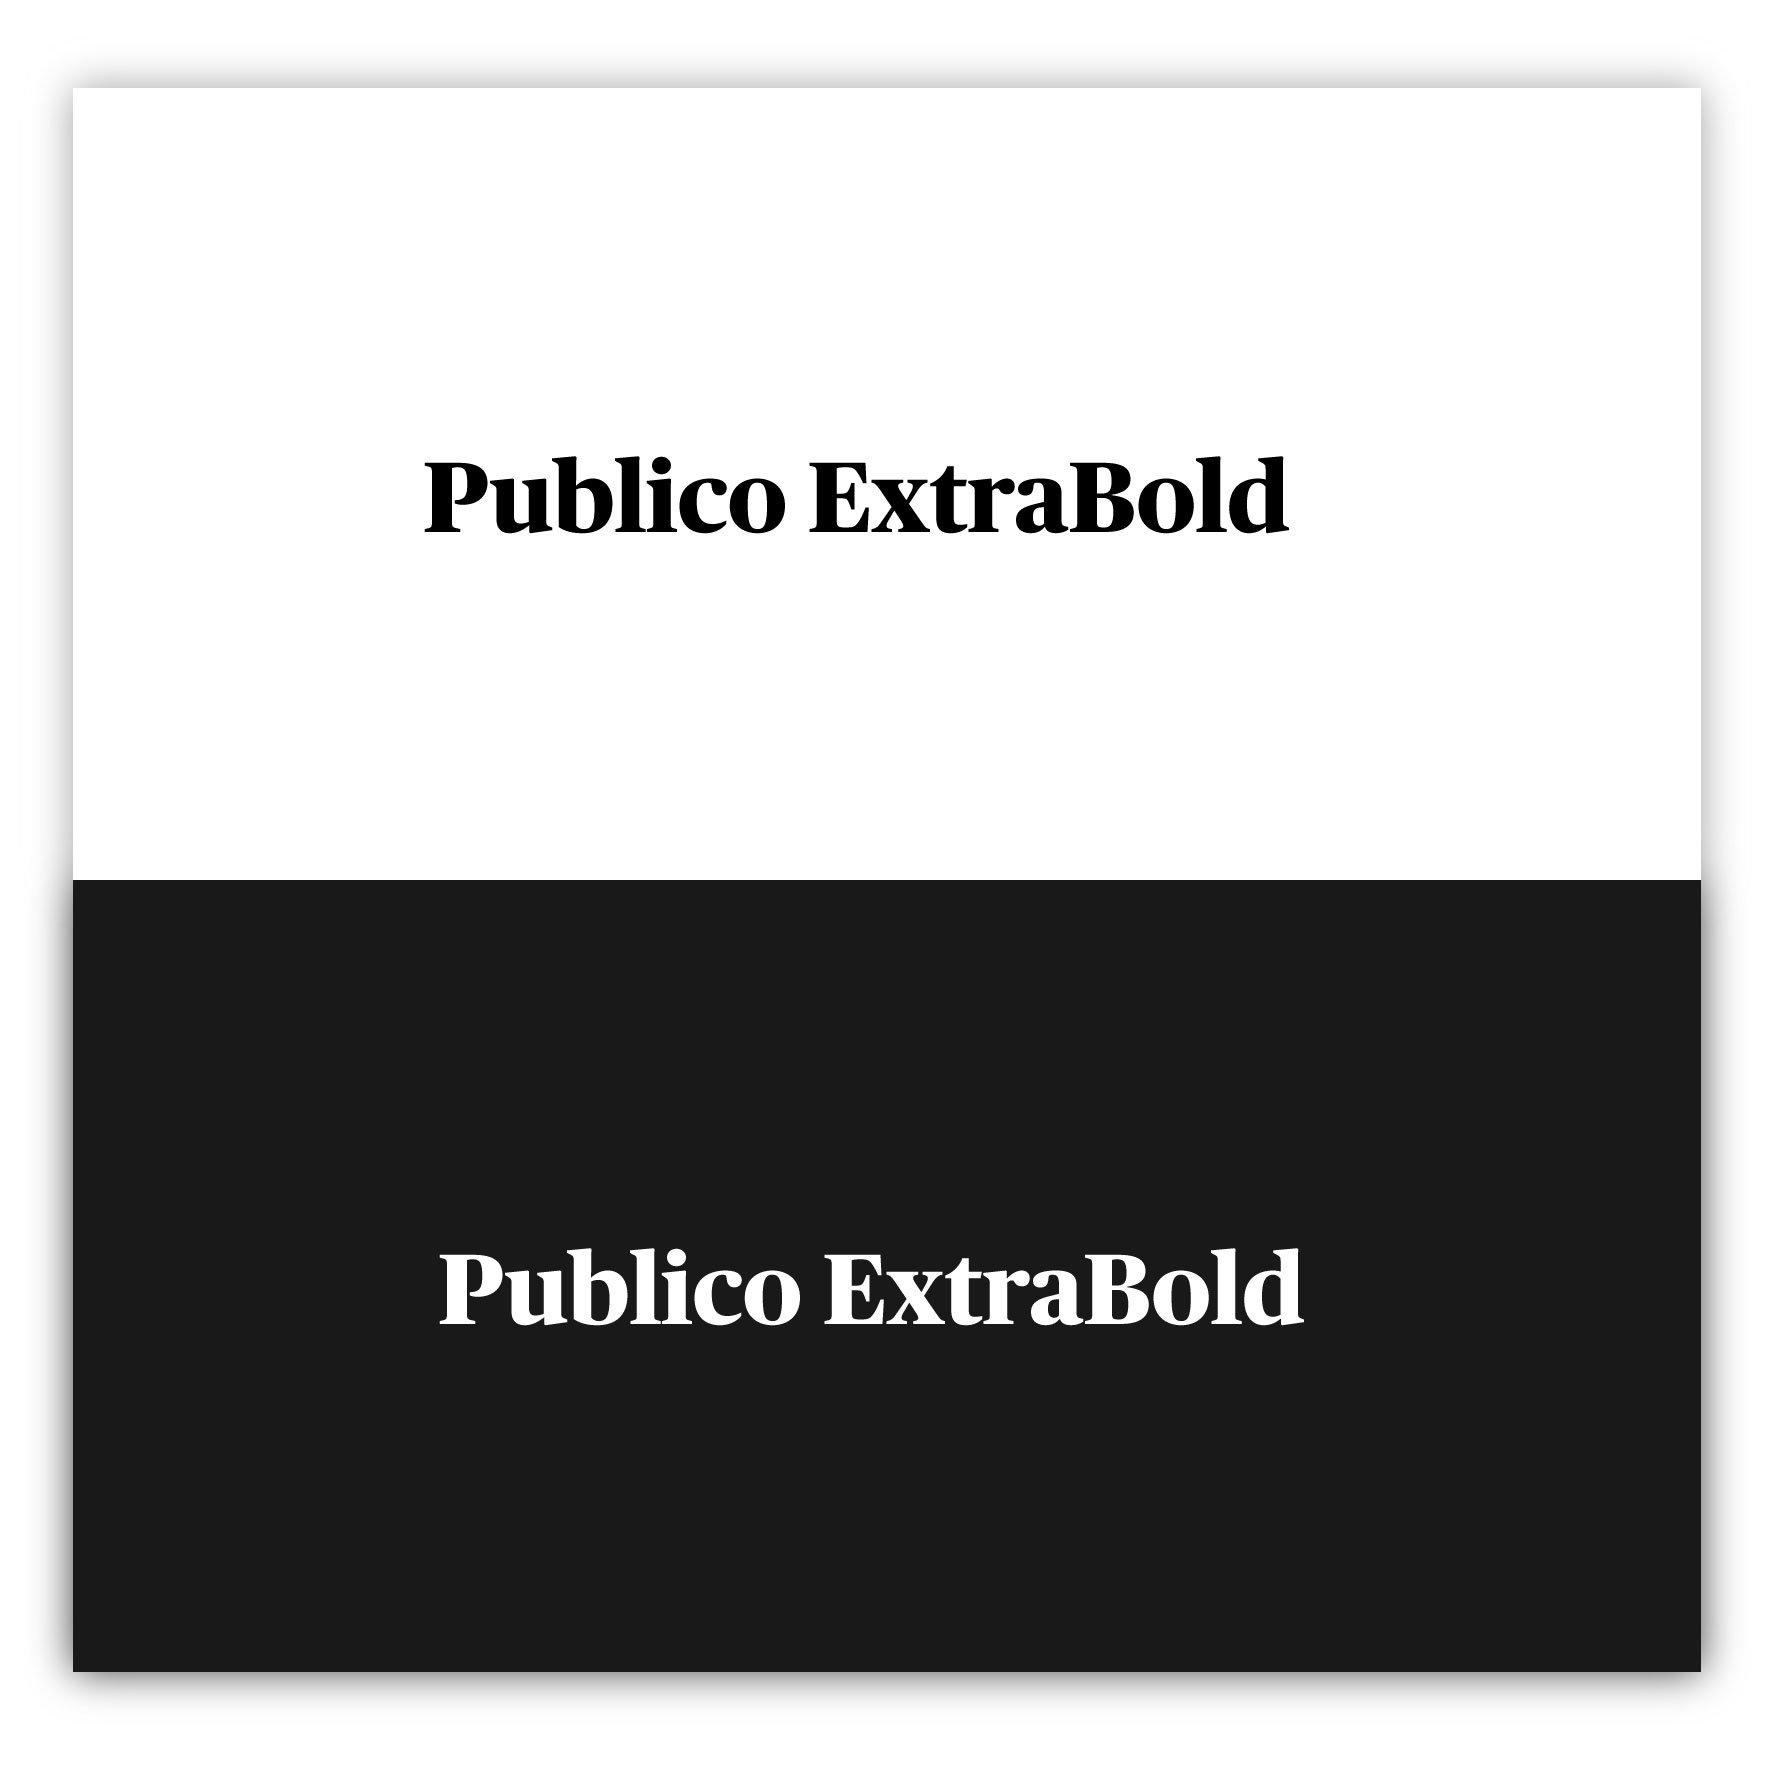 Publico ExtraBold - Modern Fonts 2020